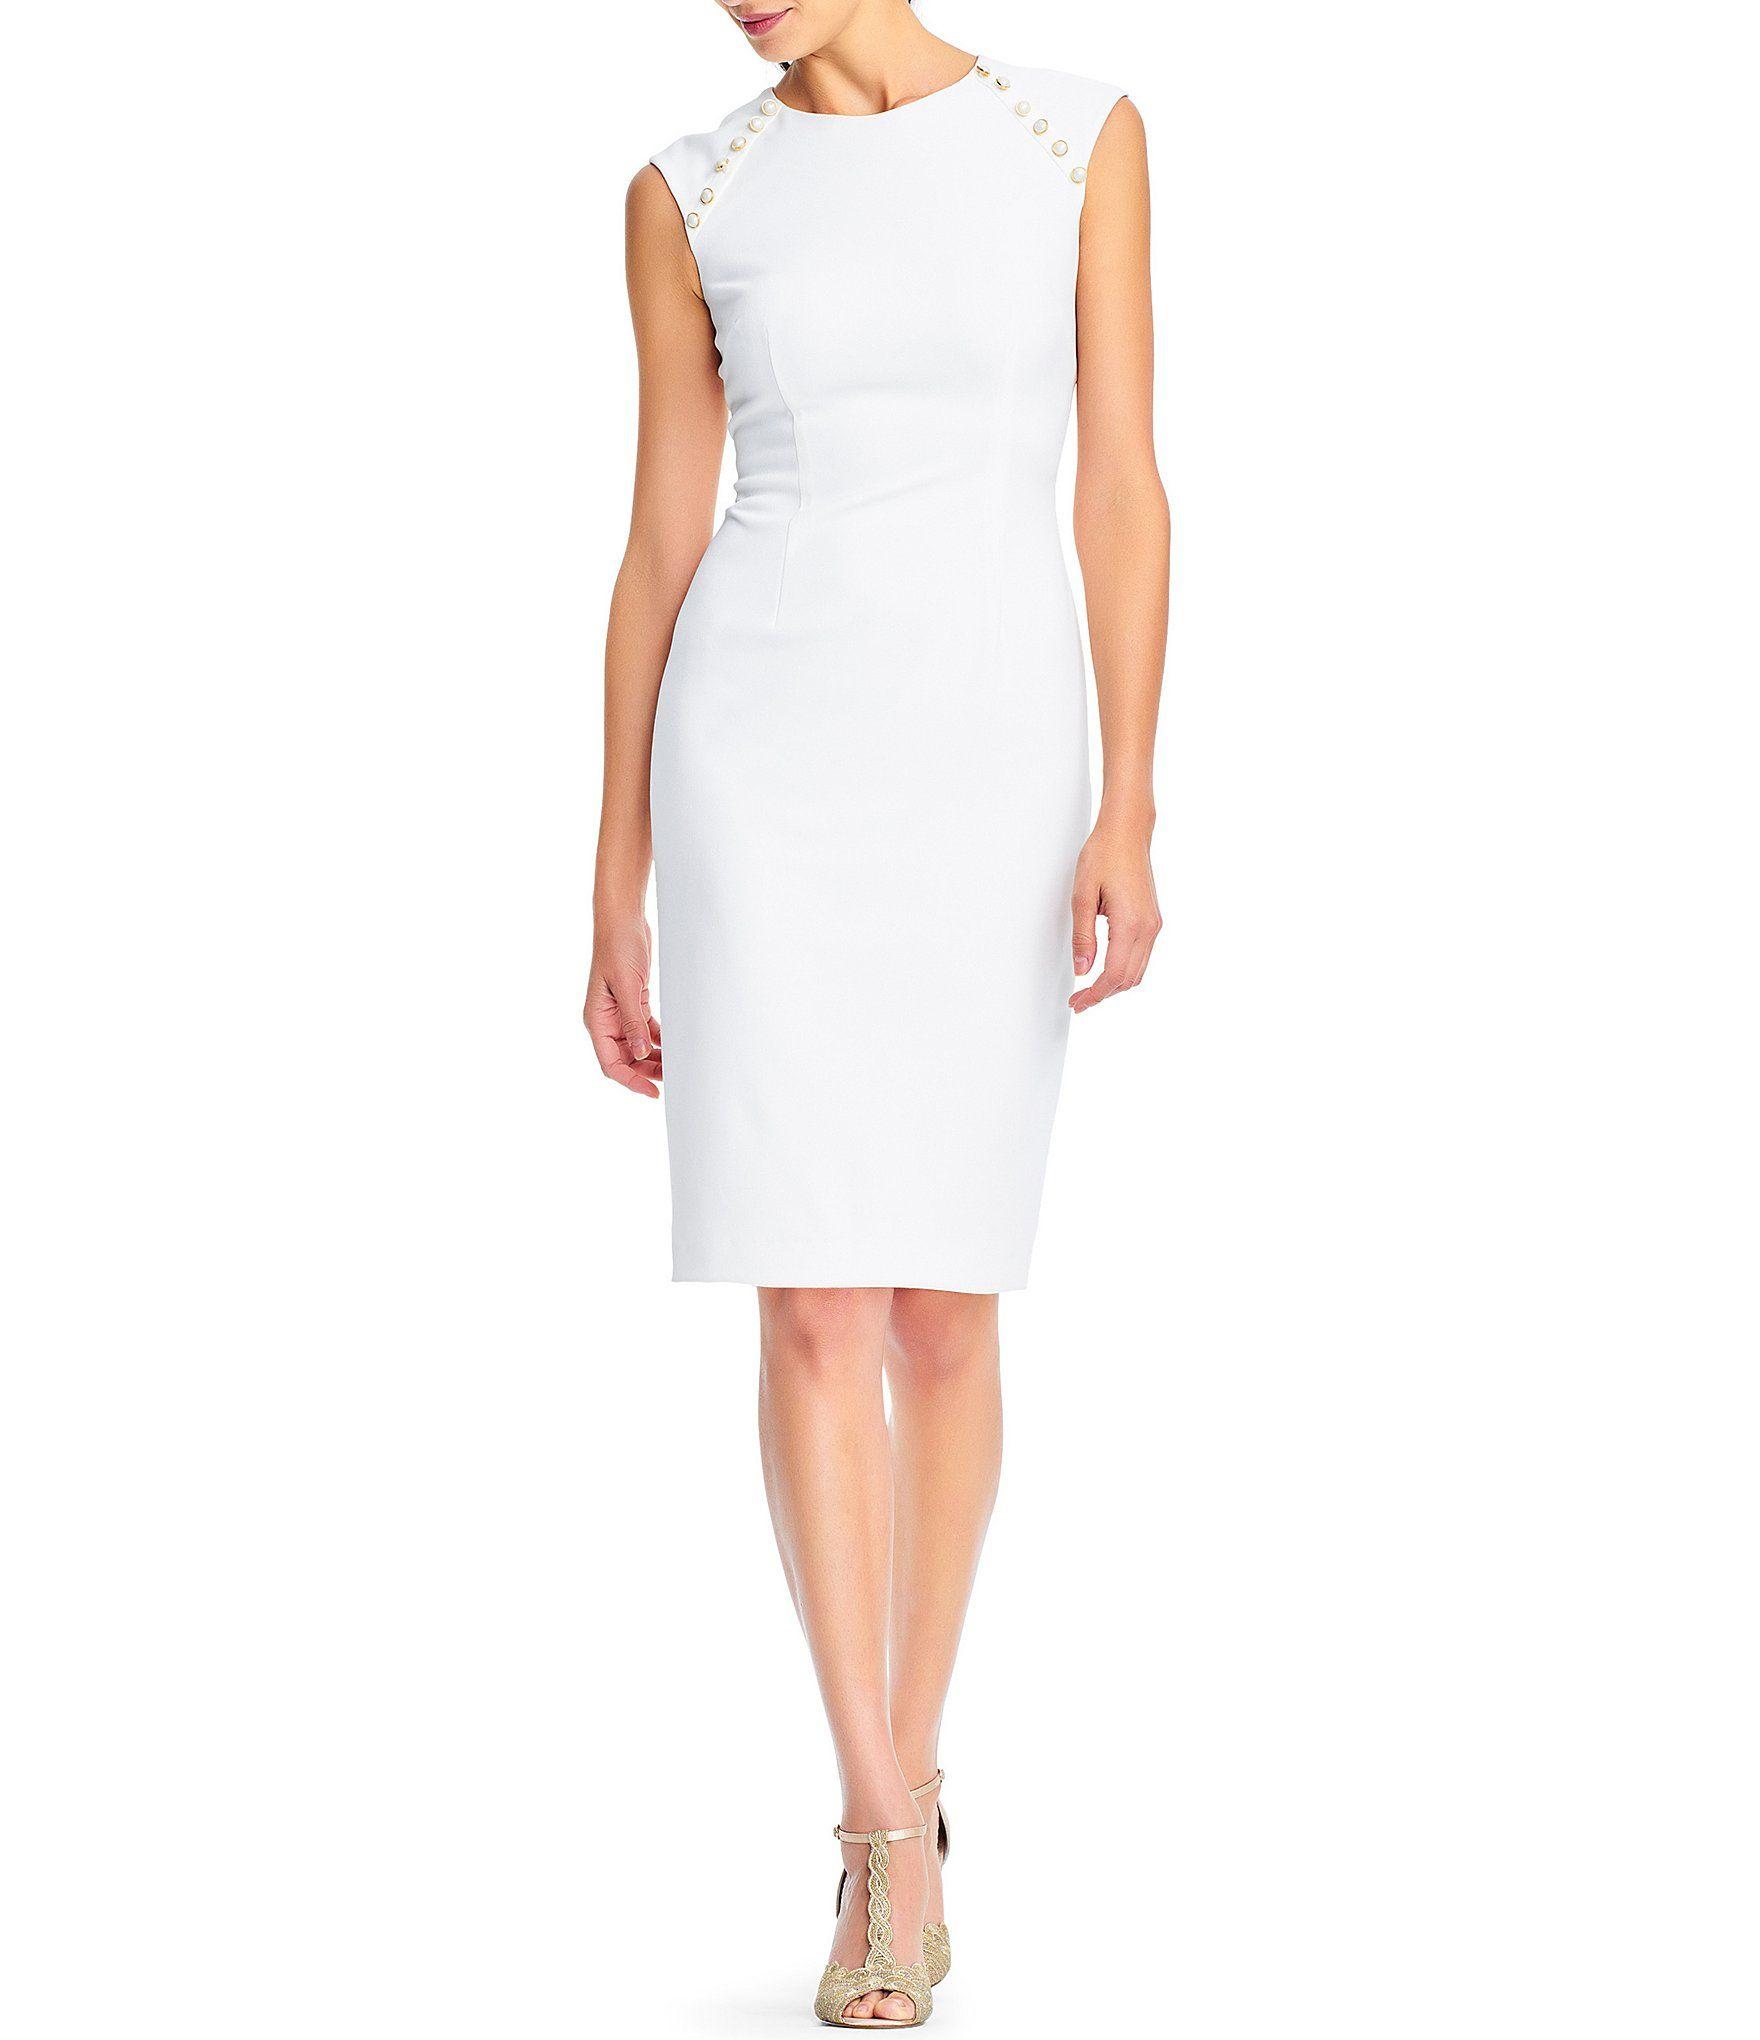 cf61e06aa56 Adrianna Papell Pearl Button Sheath Dress  Dillards